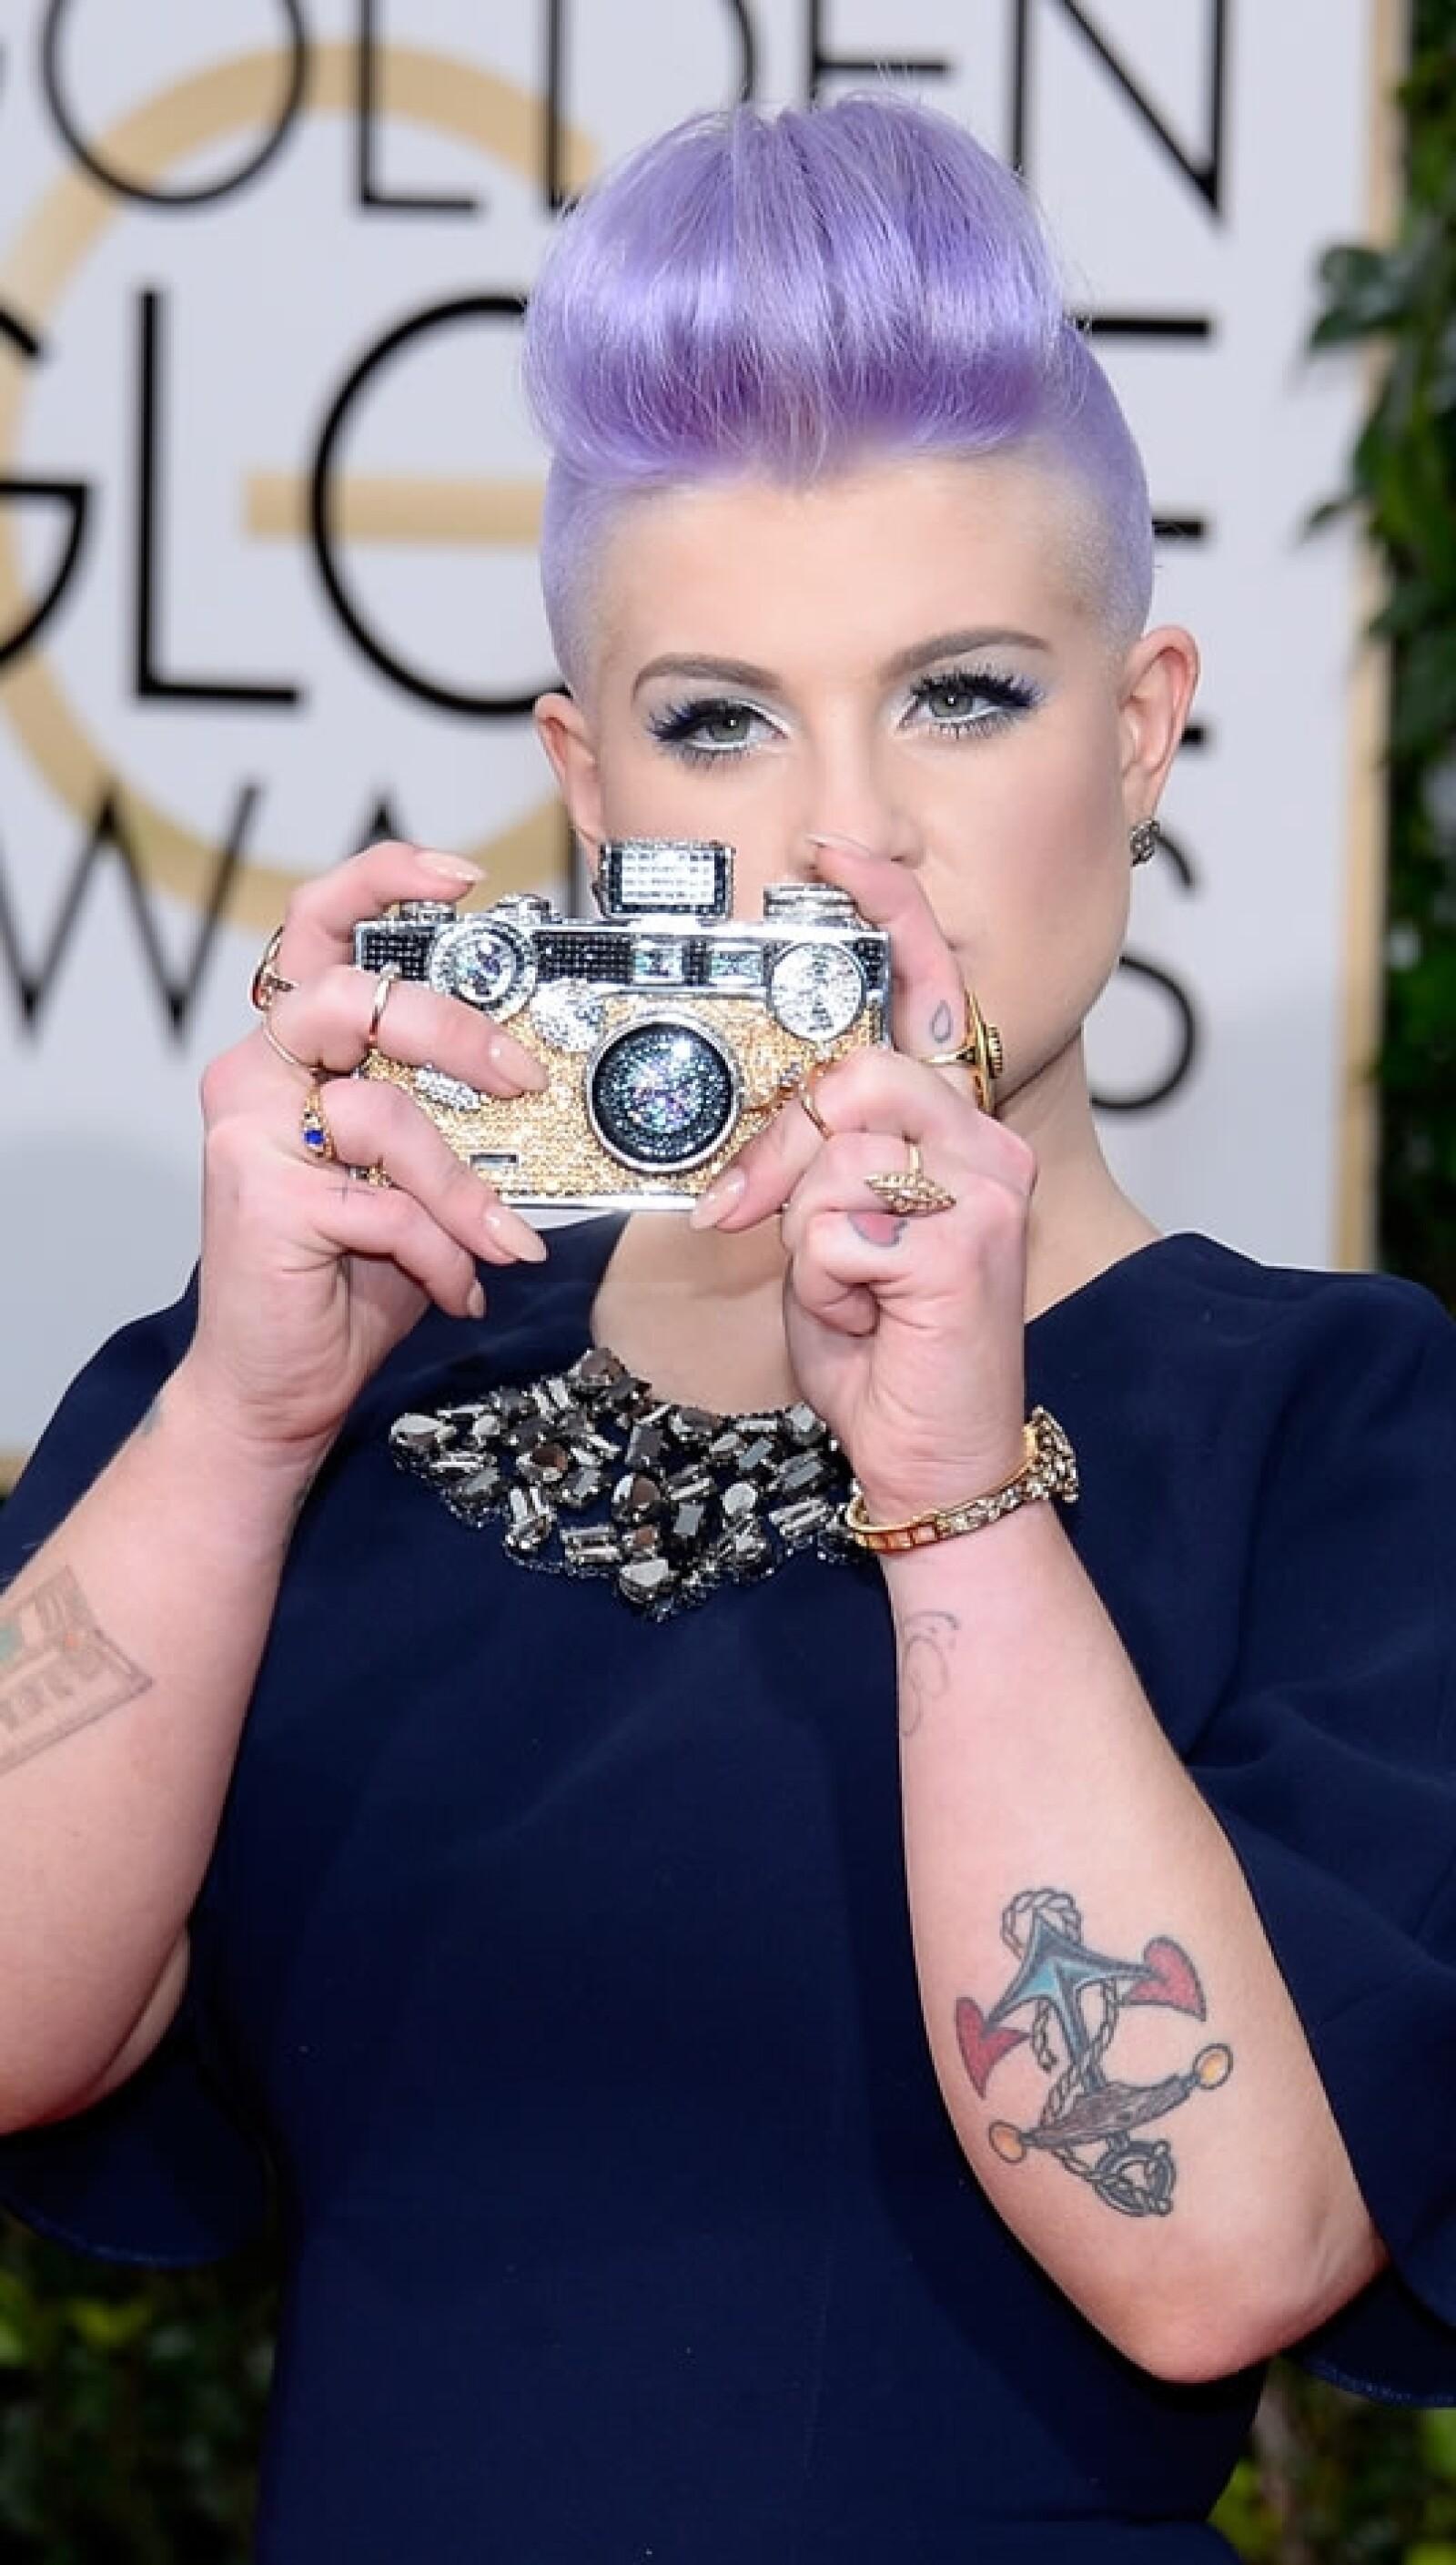 Kelly Osbourne, hija de la leyenda del rock Ozzy Osbourne, tomando una foto